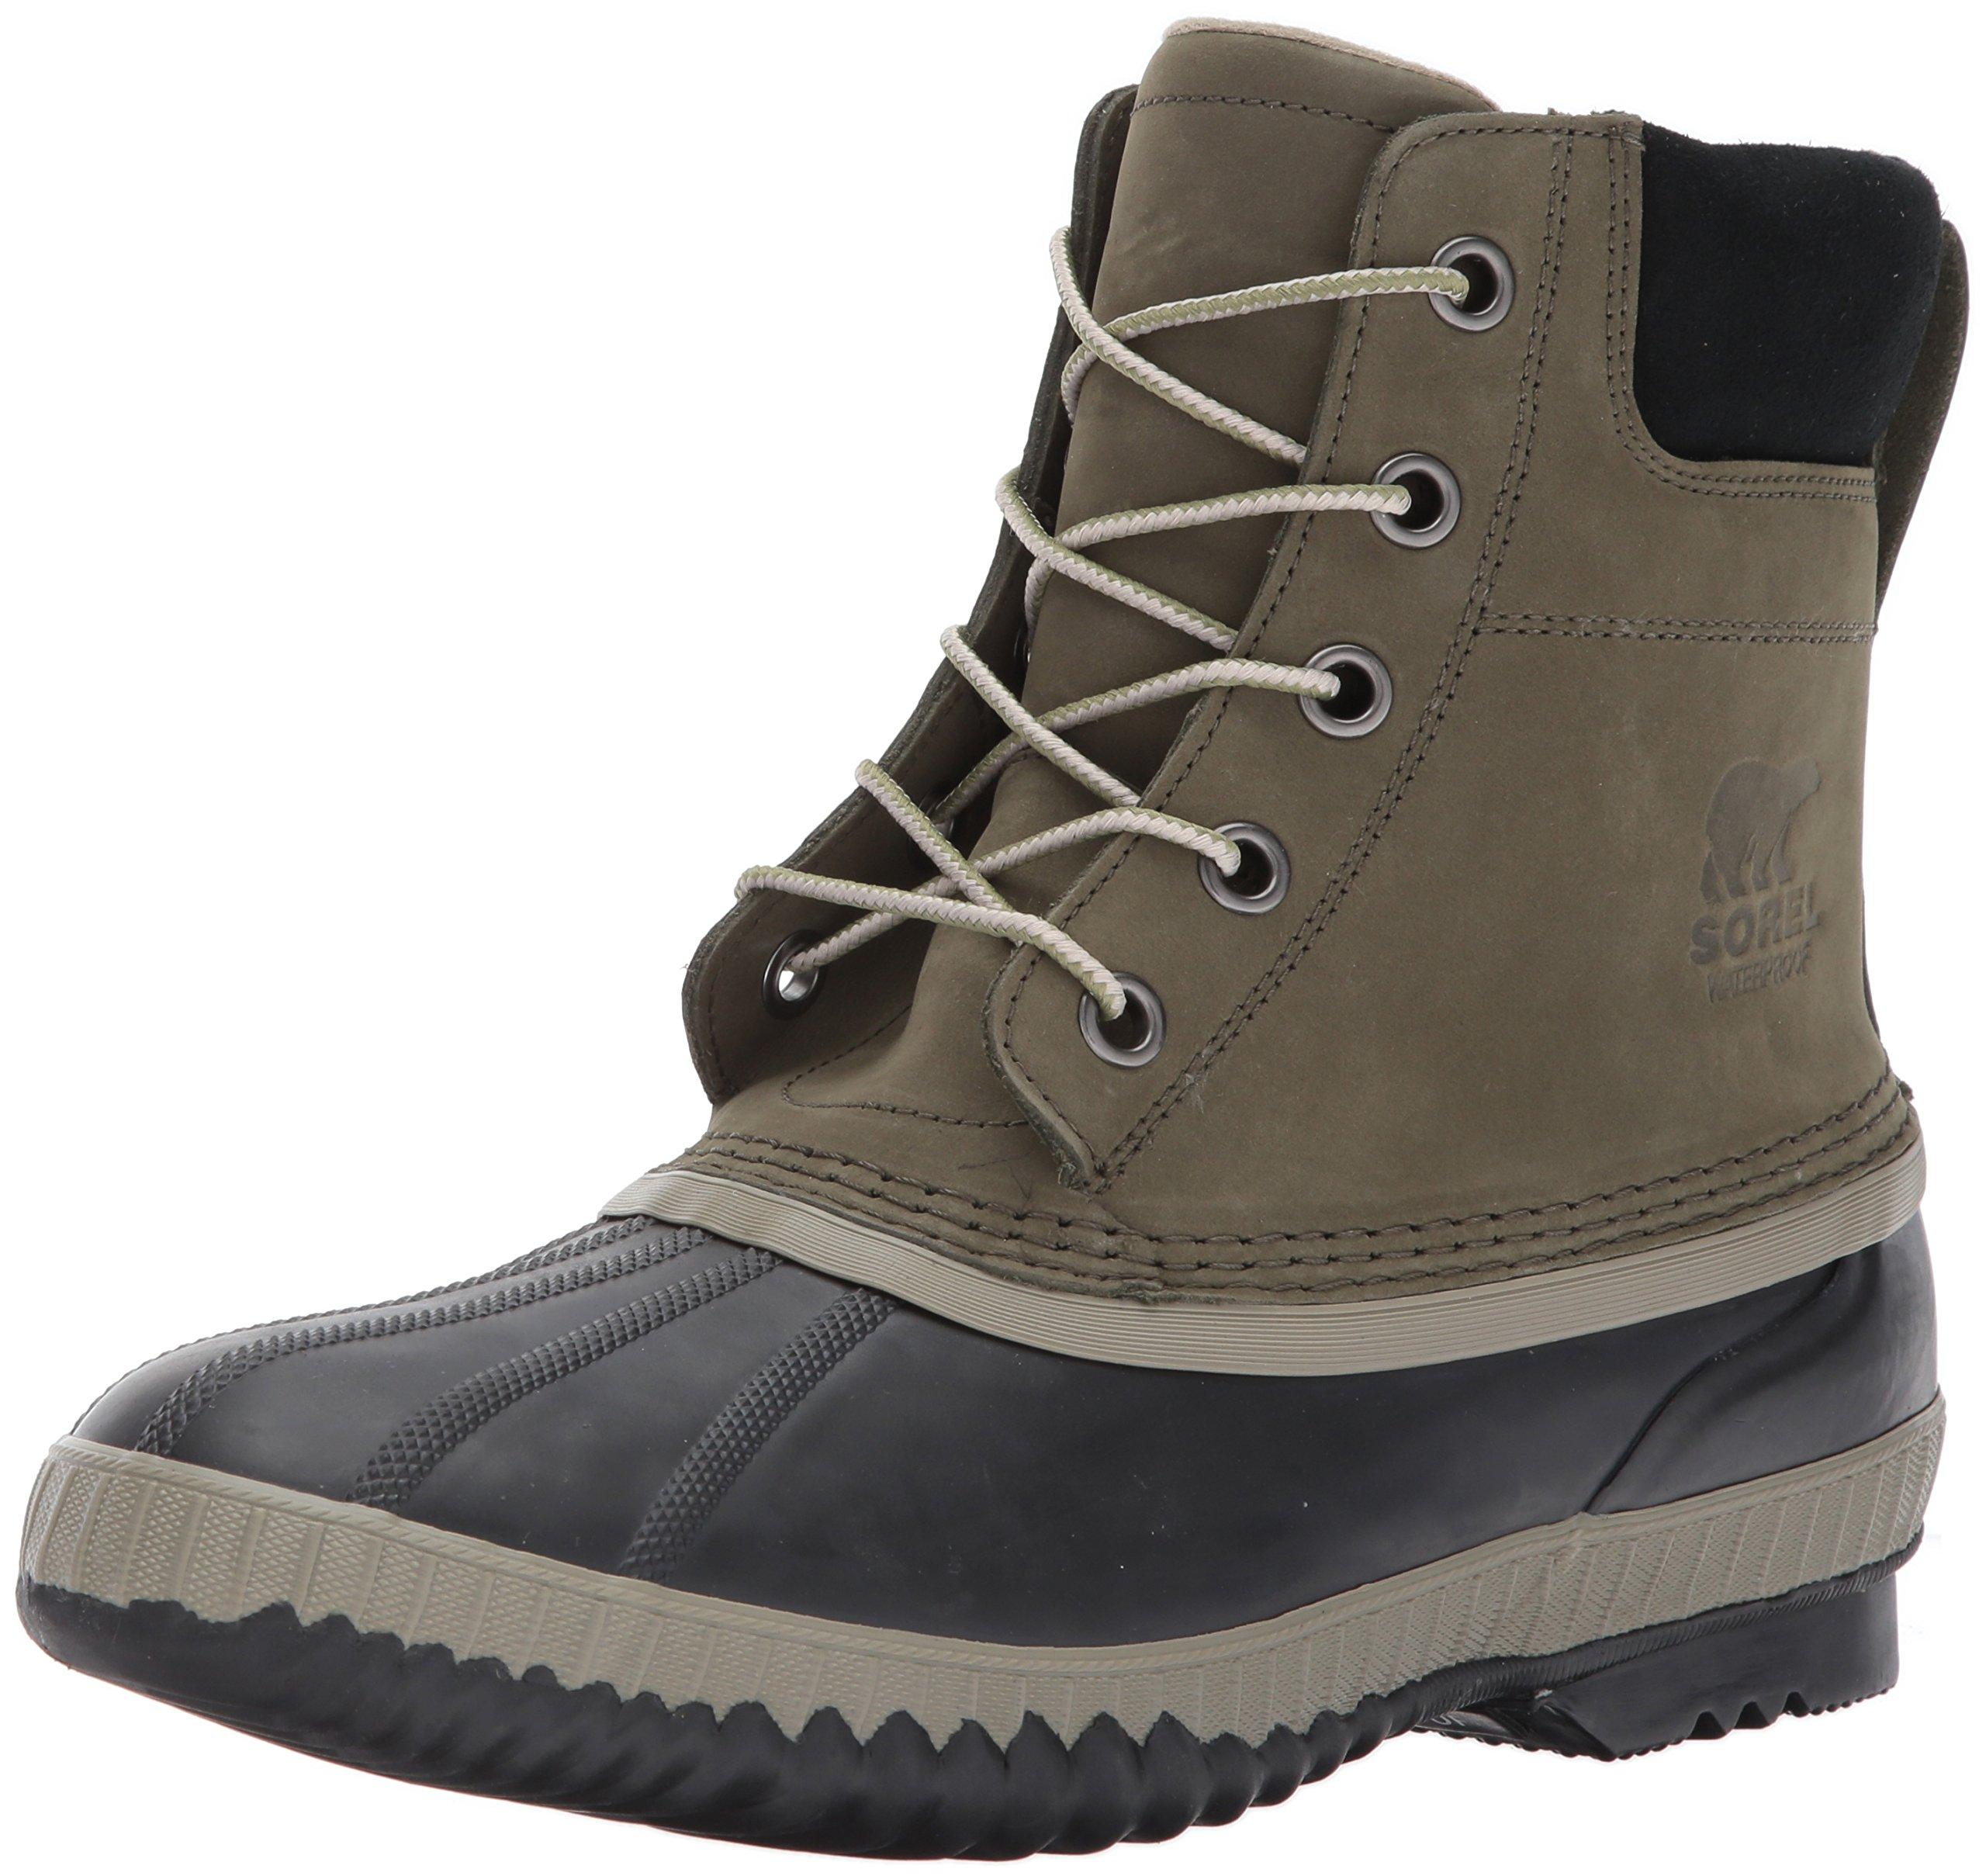 SOREL Men's Cheyanne II Snow Boot, Nori, Black, 8.5 D US by SOREL